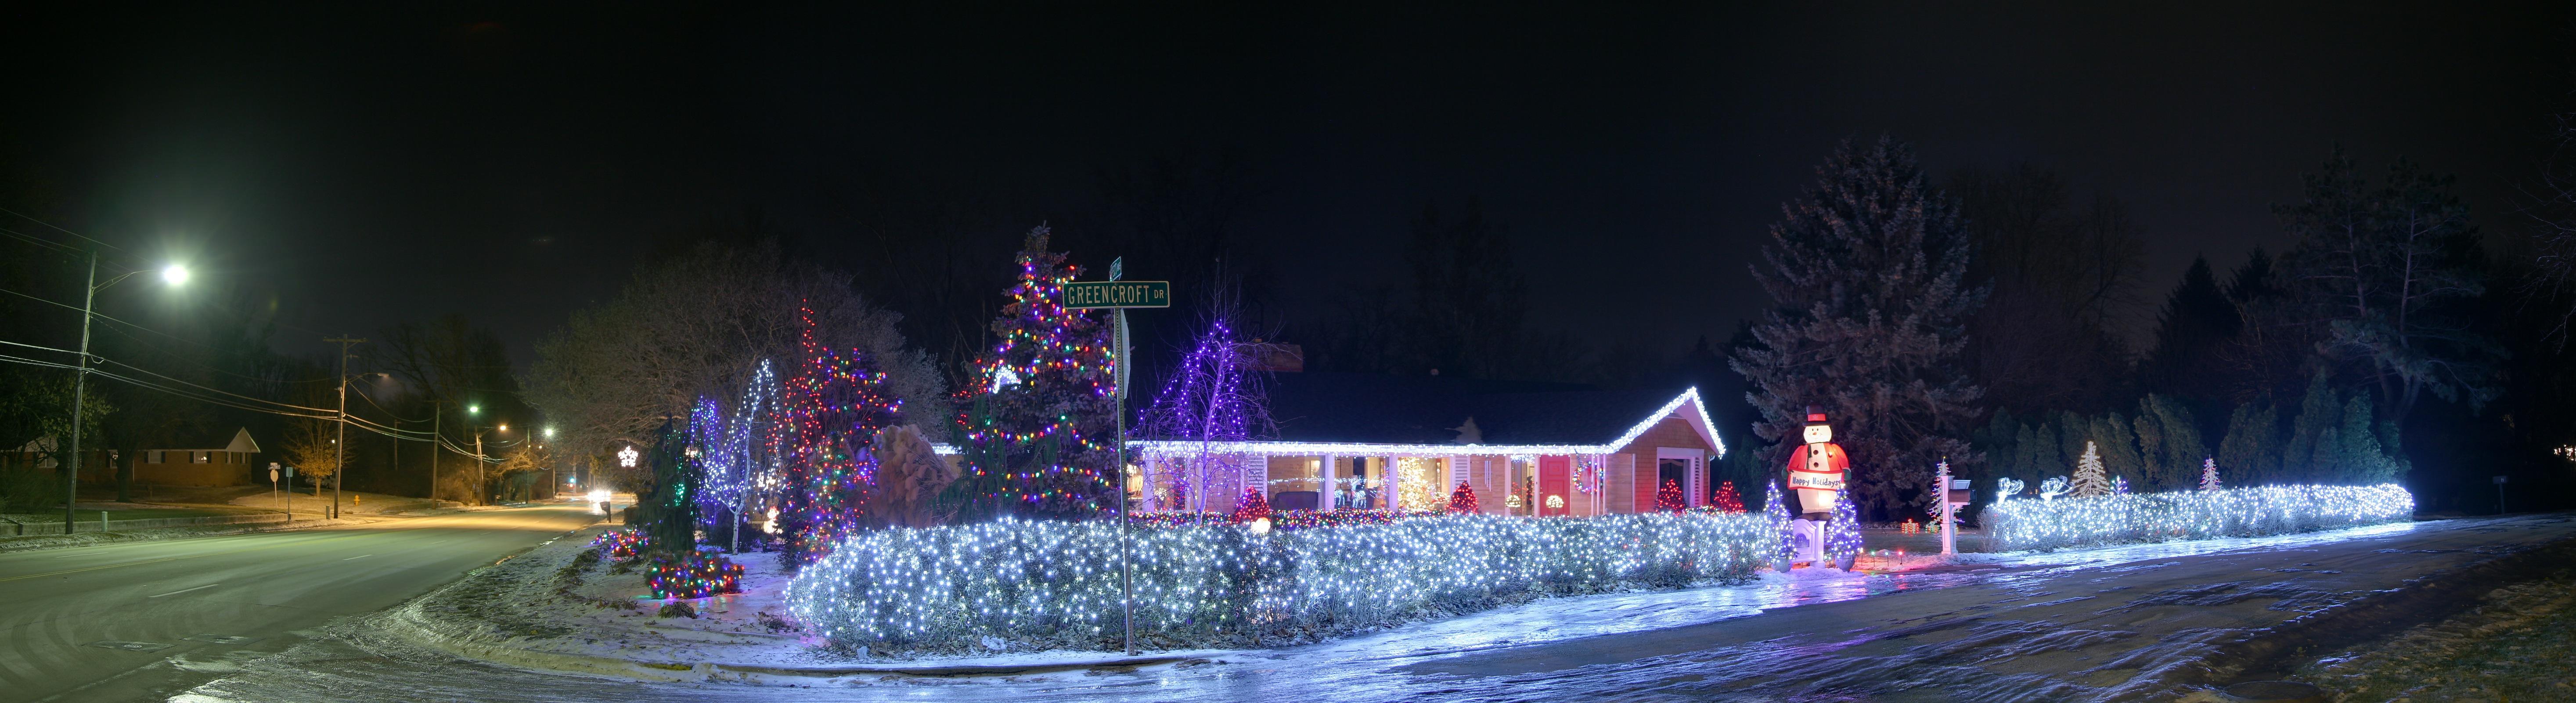 Description Christmas lights.jpg